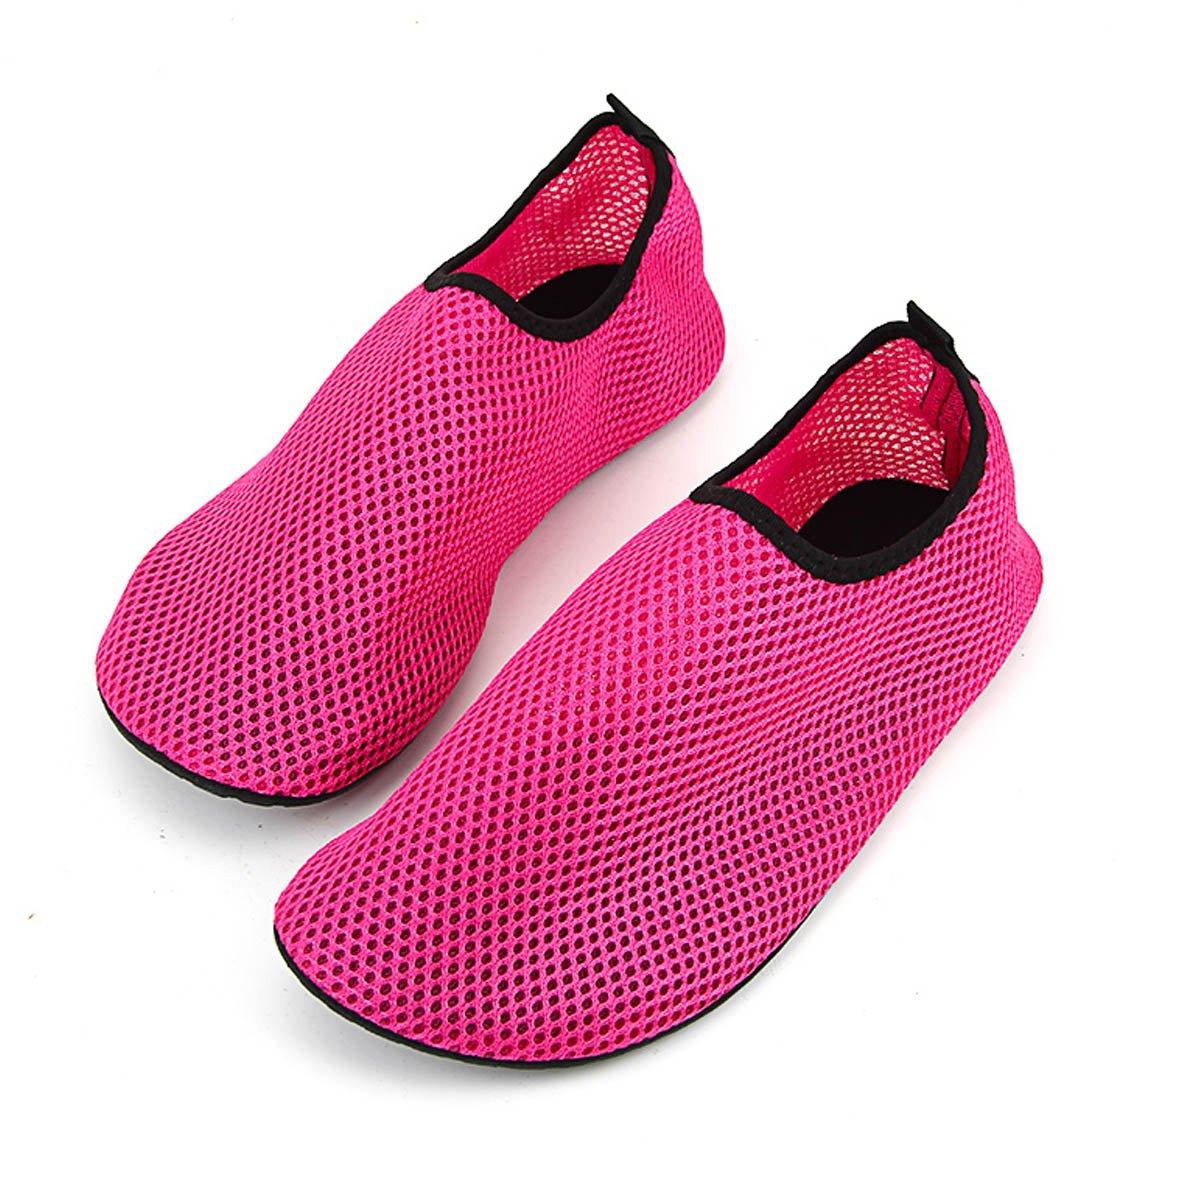 Water Shoes Slip on Aqua Socks Yoga Men Women Exercise Pool Swim Surf Beach Pool